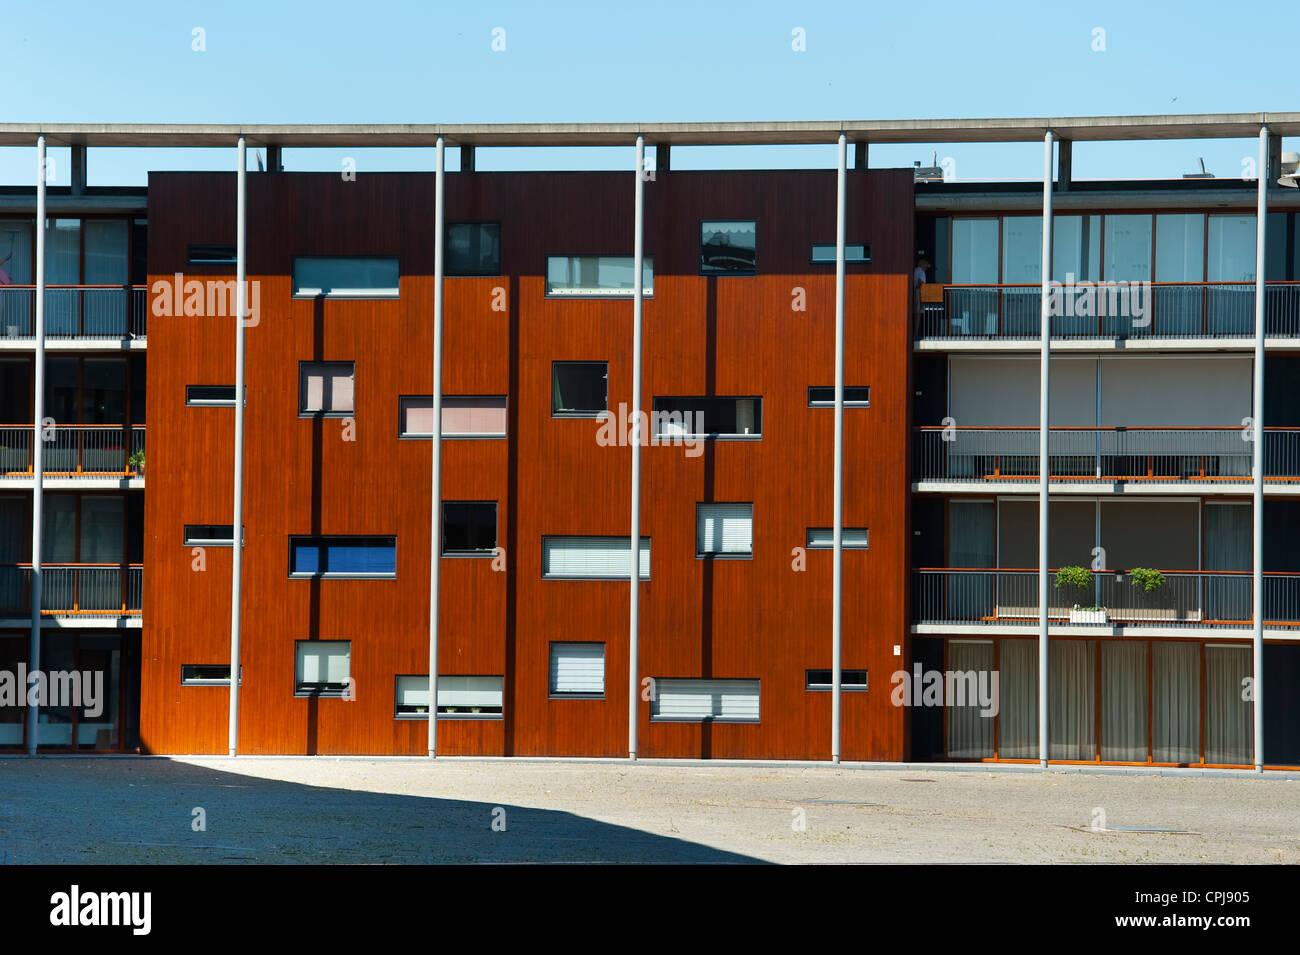 Contemporary Houses In ´herdenkingsplein´ Square Stockfotos ...